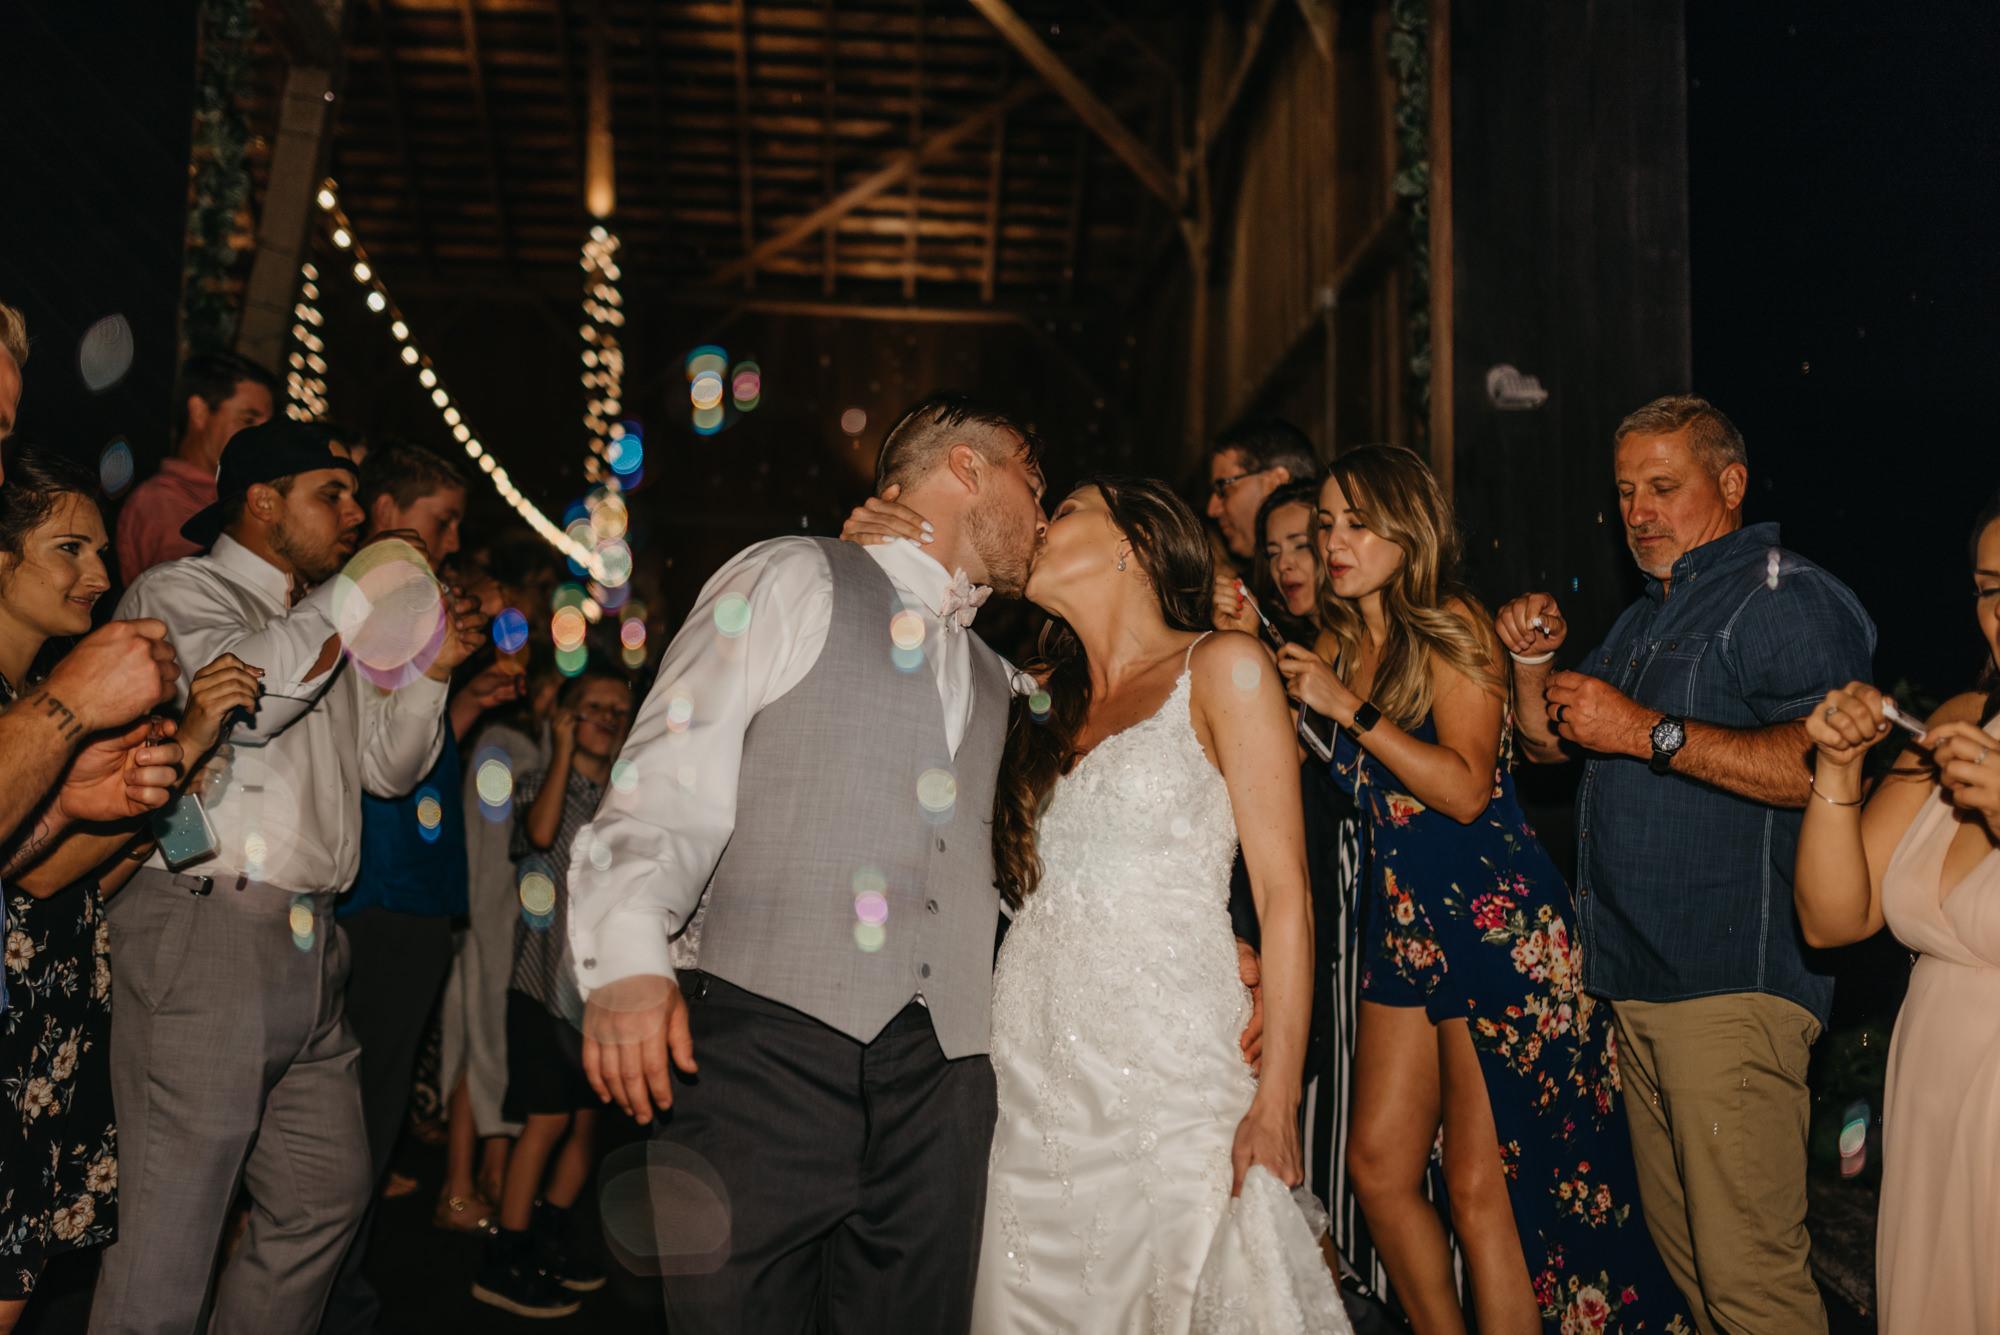 226-portland-northwest-wedding-bubble-exit-barn-string-lights.jpg